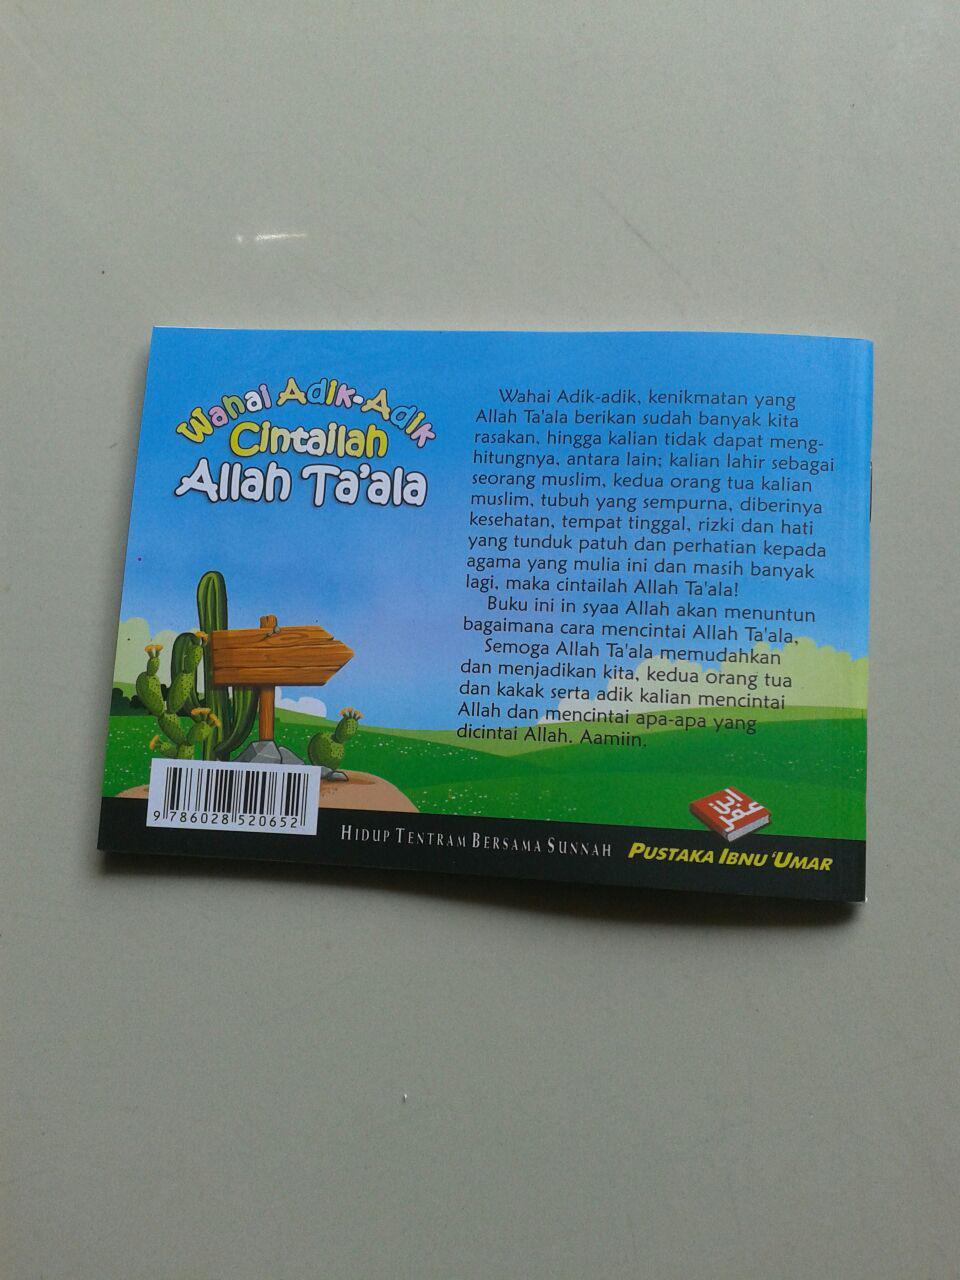 Buku Saku Anak Wahai Adik Adik Cintailah Allah Ta'ala cover 2